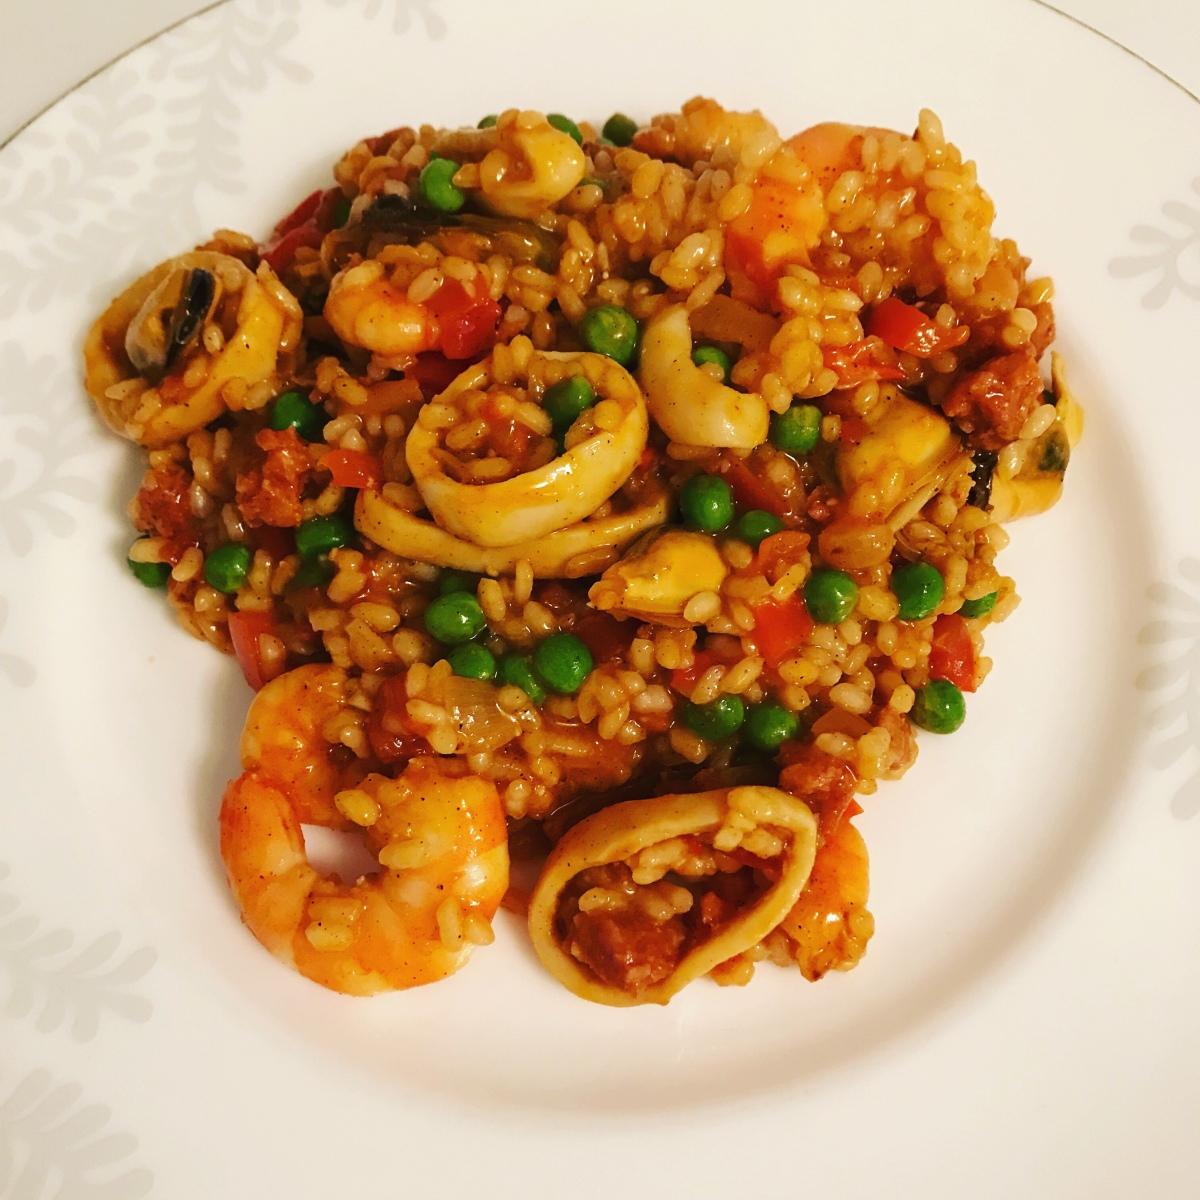 Seafood and chorizopaella